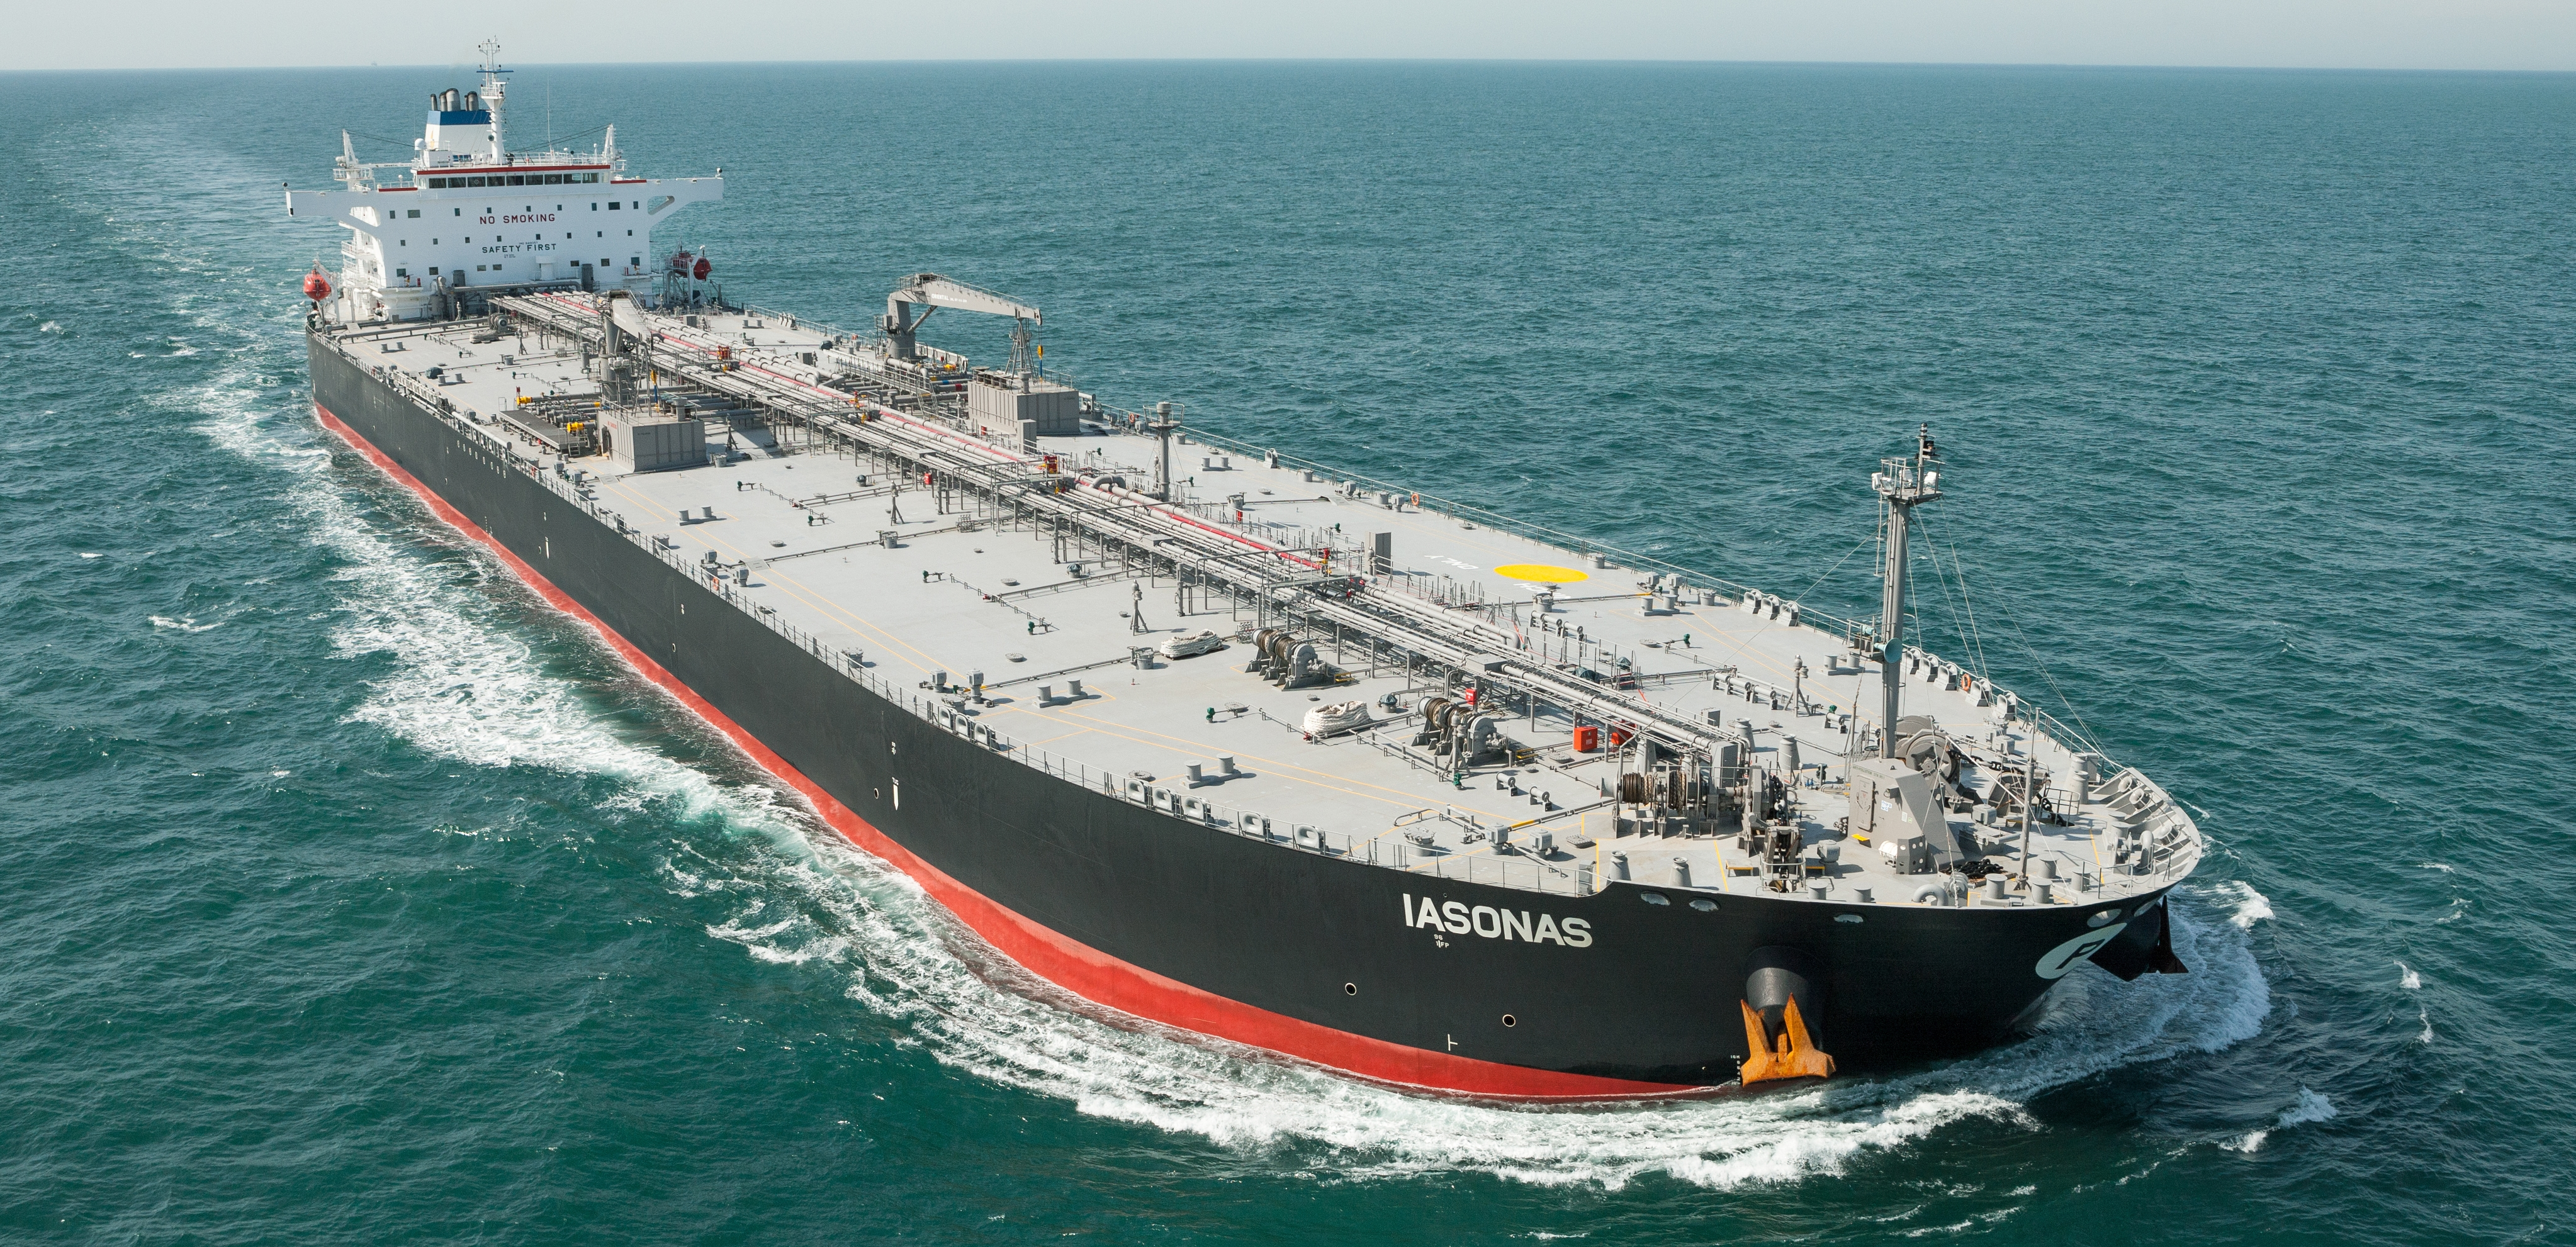 Liquimar – Tankers Management Services Inc